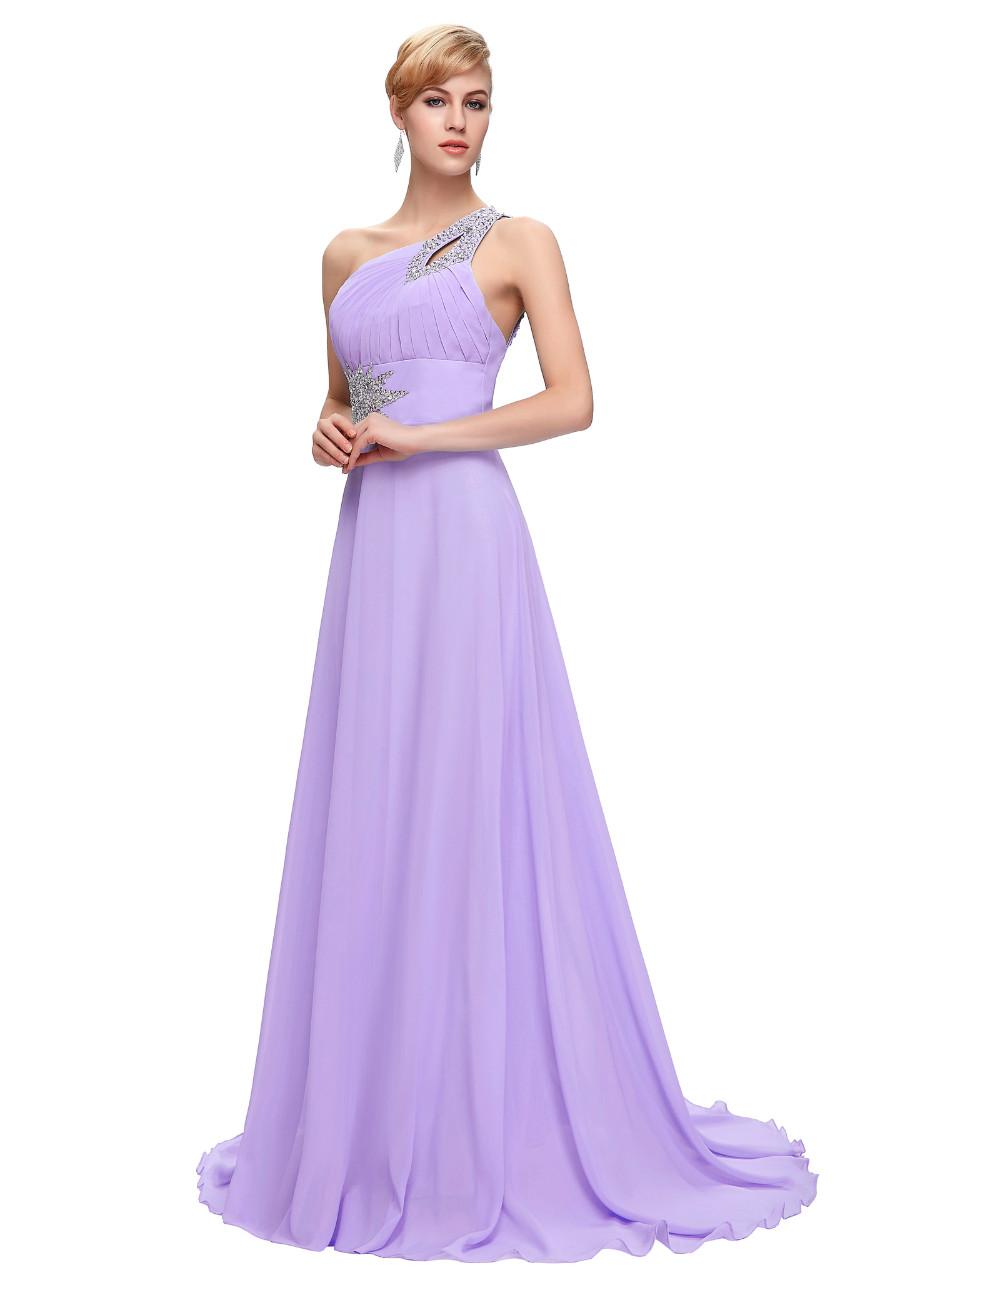 Elegant One Shoulder Long Bridesmaid Dress 19